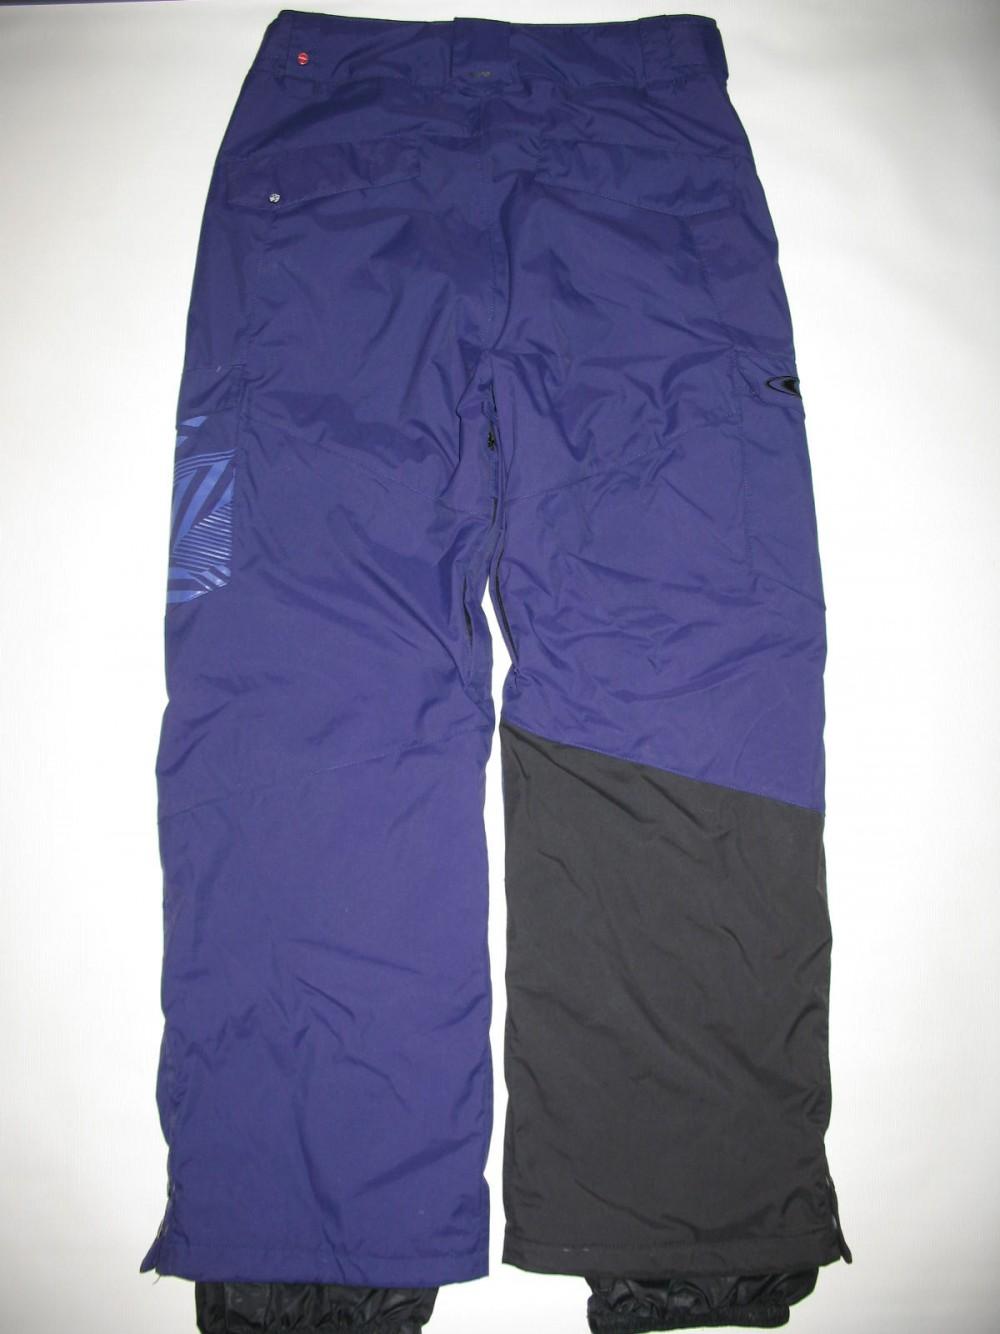 Штаны O'NEILL 10/10 snowboard pants (размер S) - 1